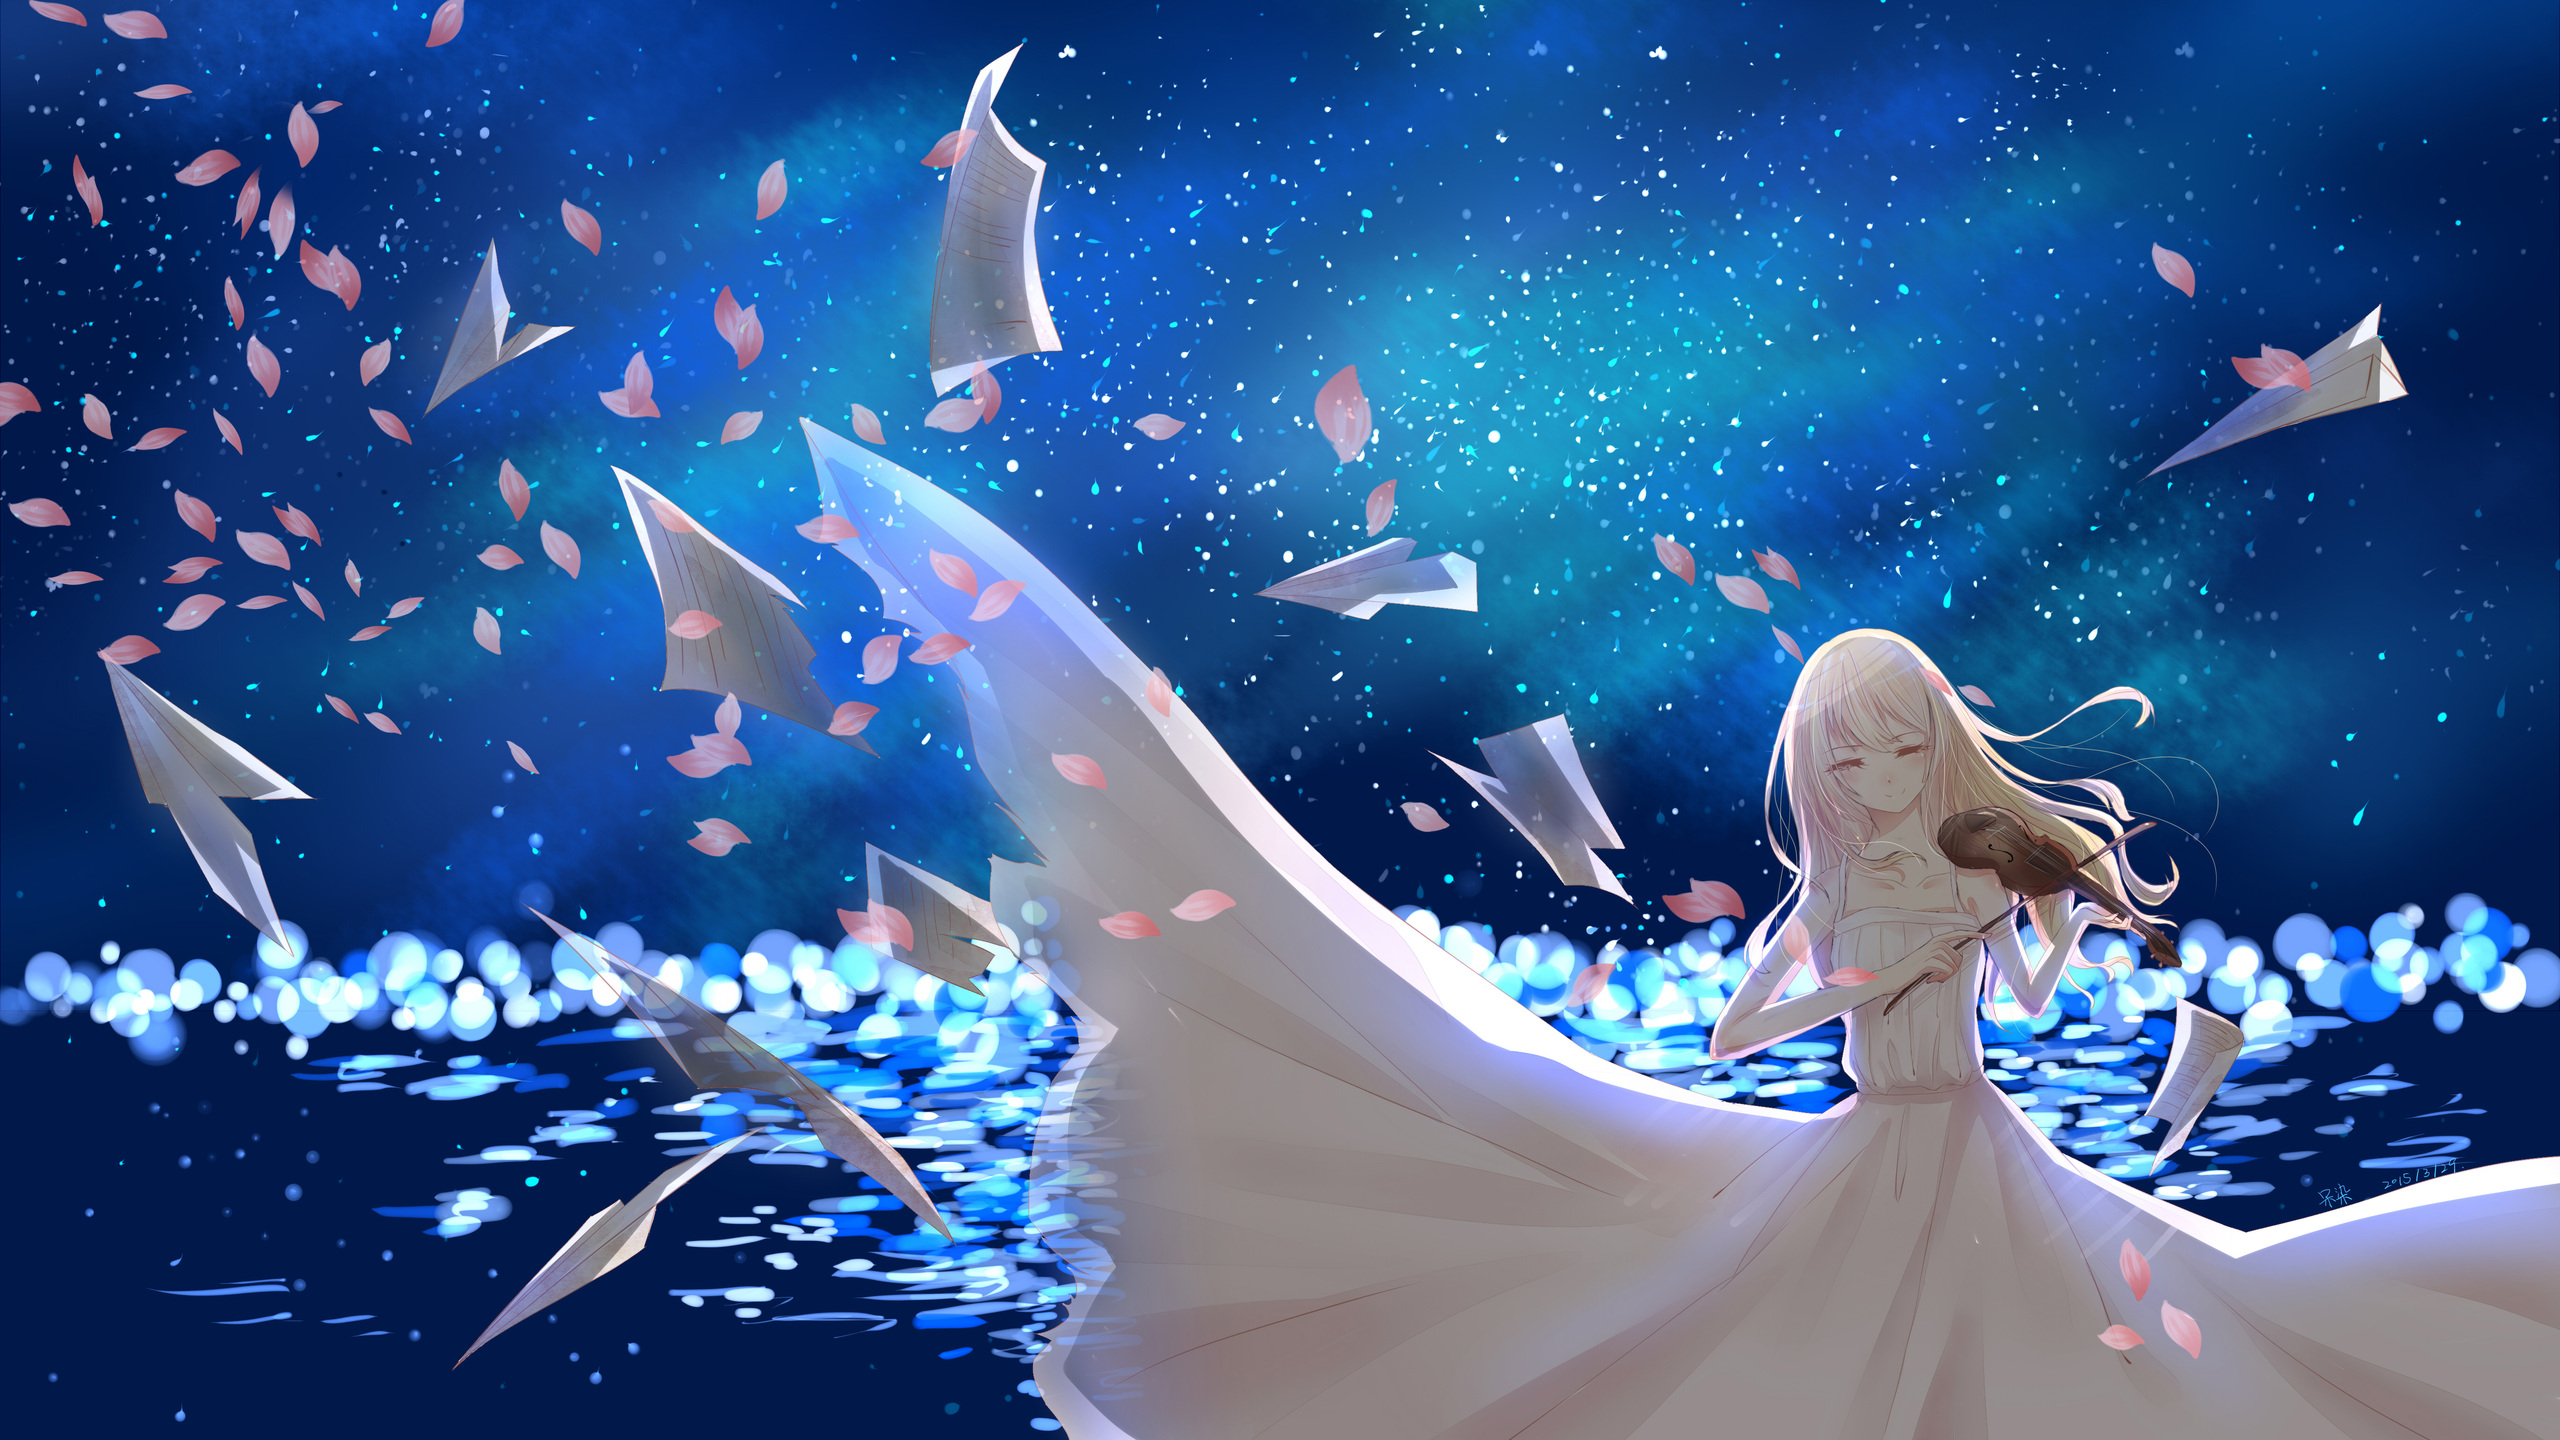 Your Lie In April Wallpaper Hd: 2560x1440 Kaori Miyazono Your Lie In April 5k 1440P